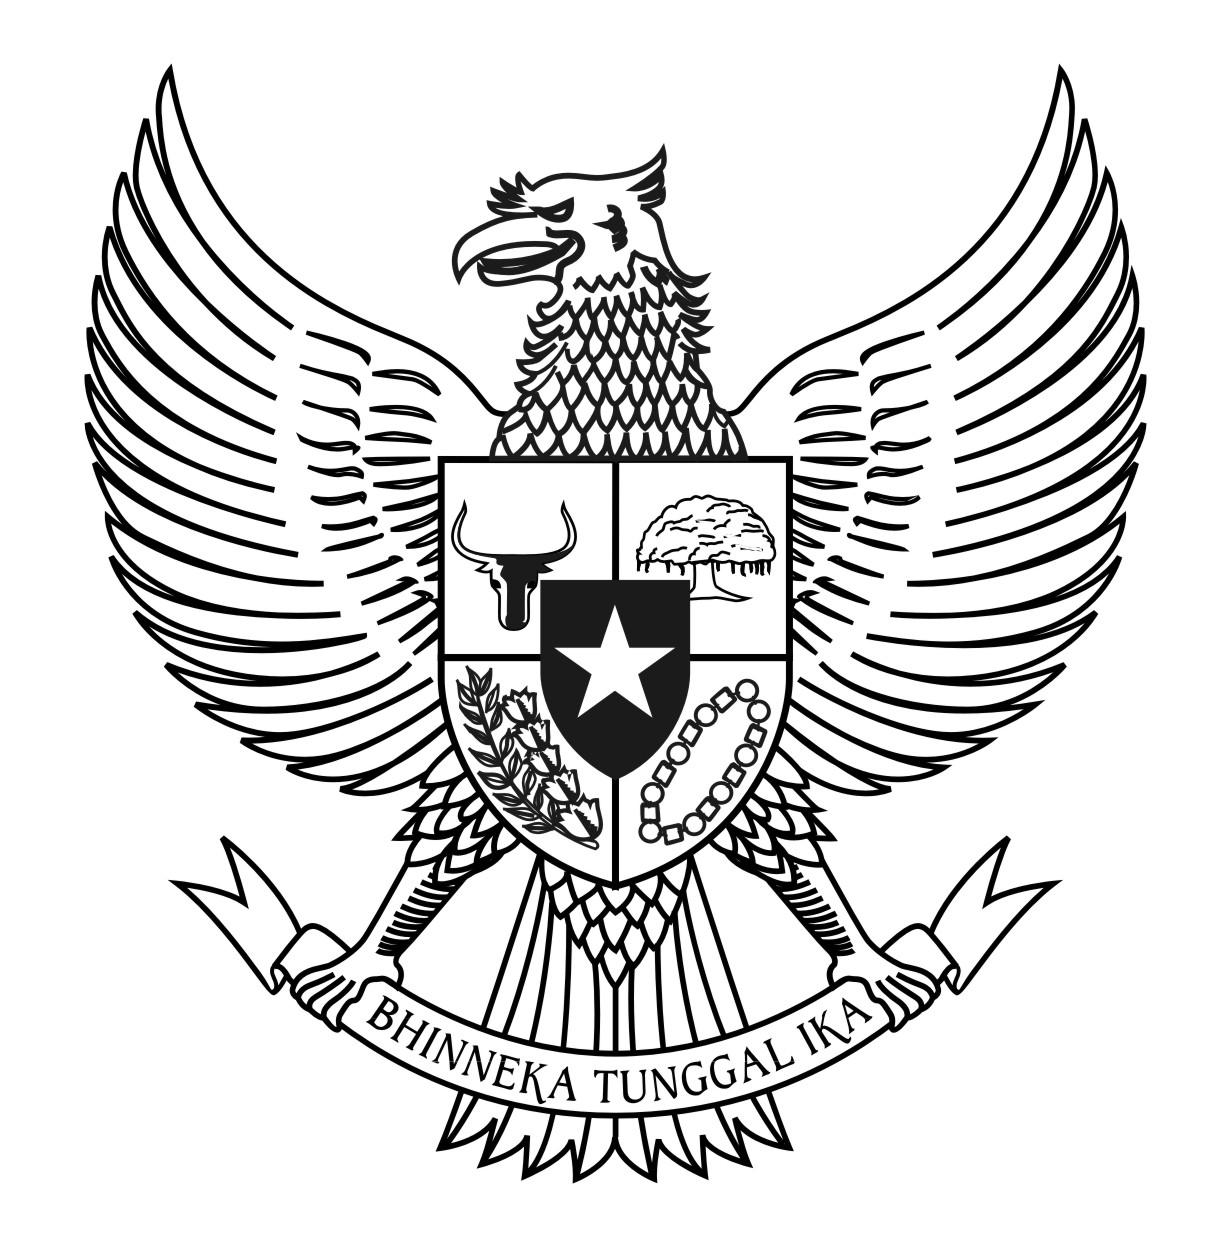 Fourth image of Gambar Burung Garuda Pancasila Untuk Mewarnai with Logo Garuda Pancasila BW | Hitam Putih vector cdr ...